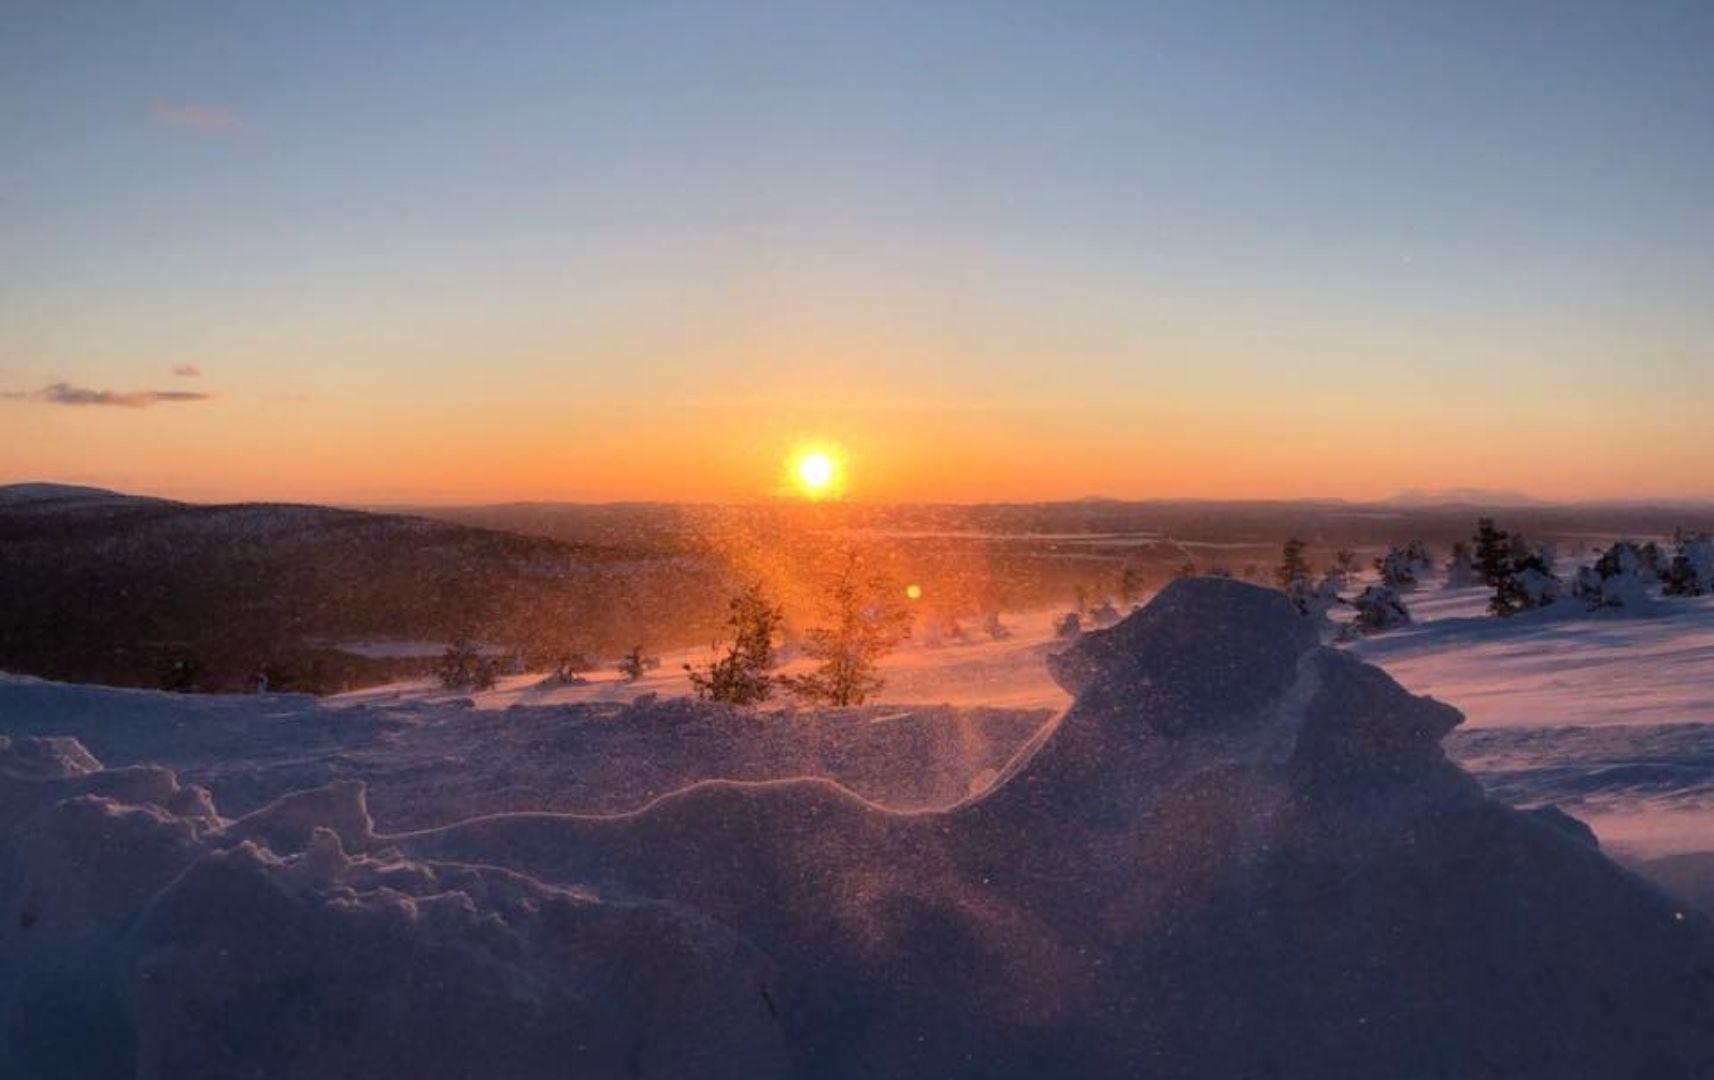 Finnland Reisebericht Reiseart